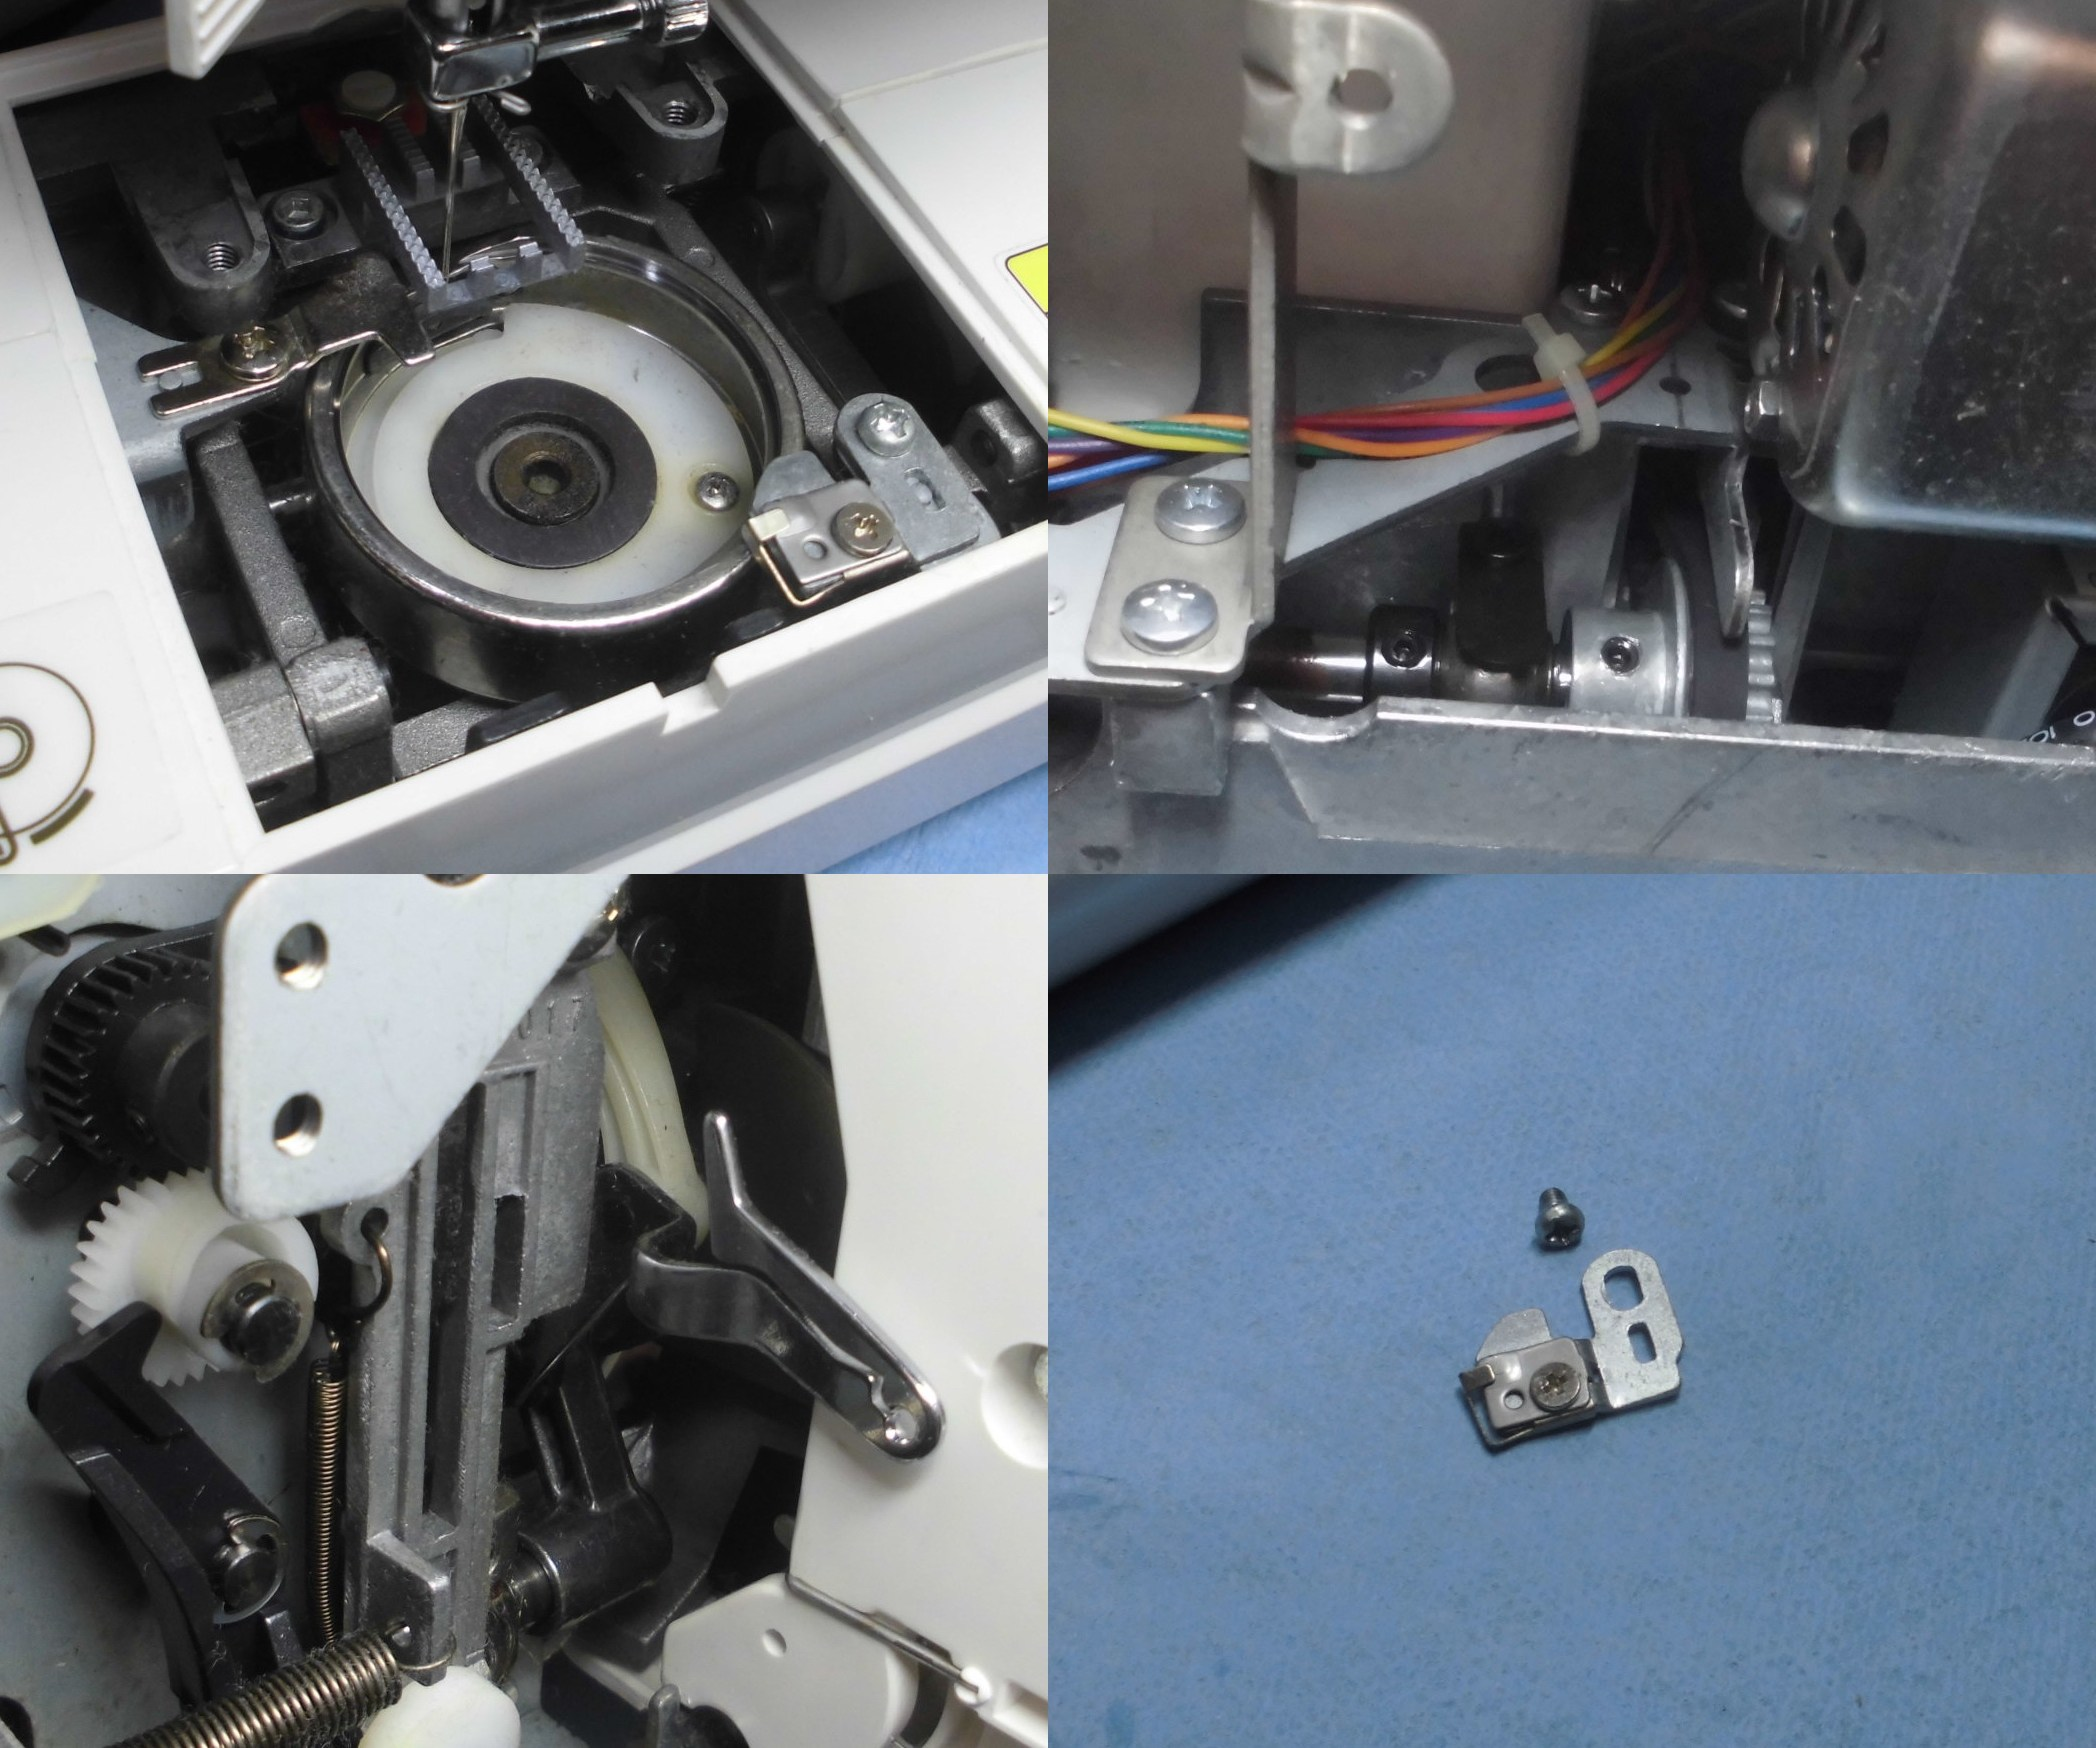 ISJ-2500の全体メンテナンス修理|釜ずれ、釜留めの変形、異音